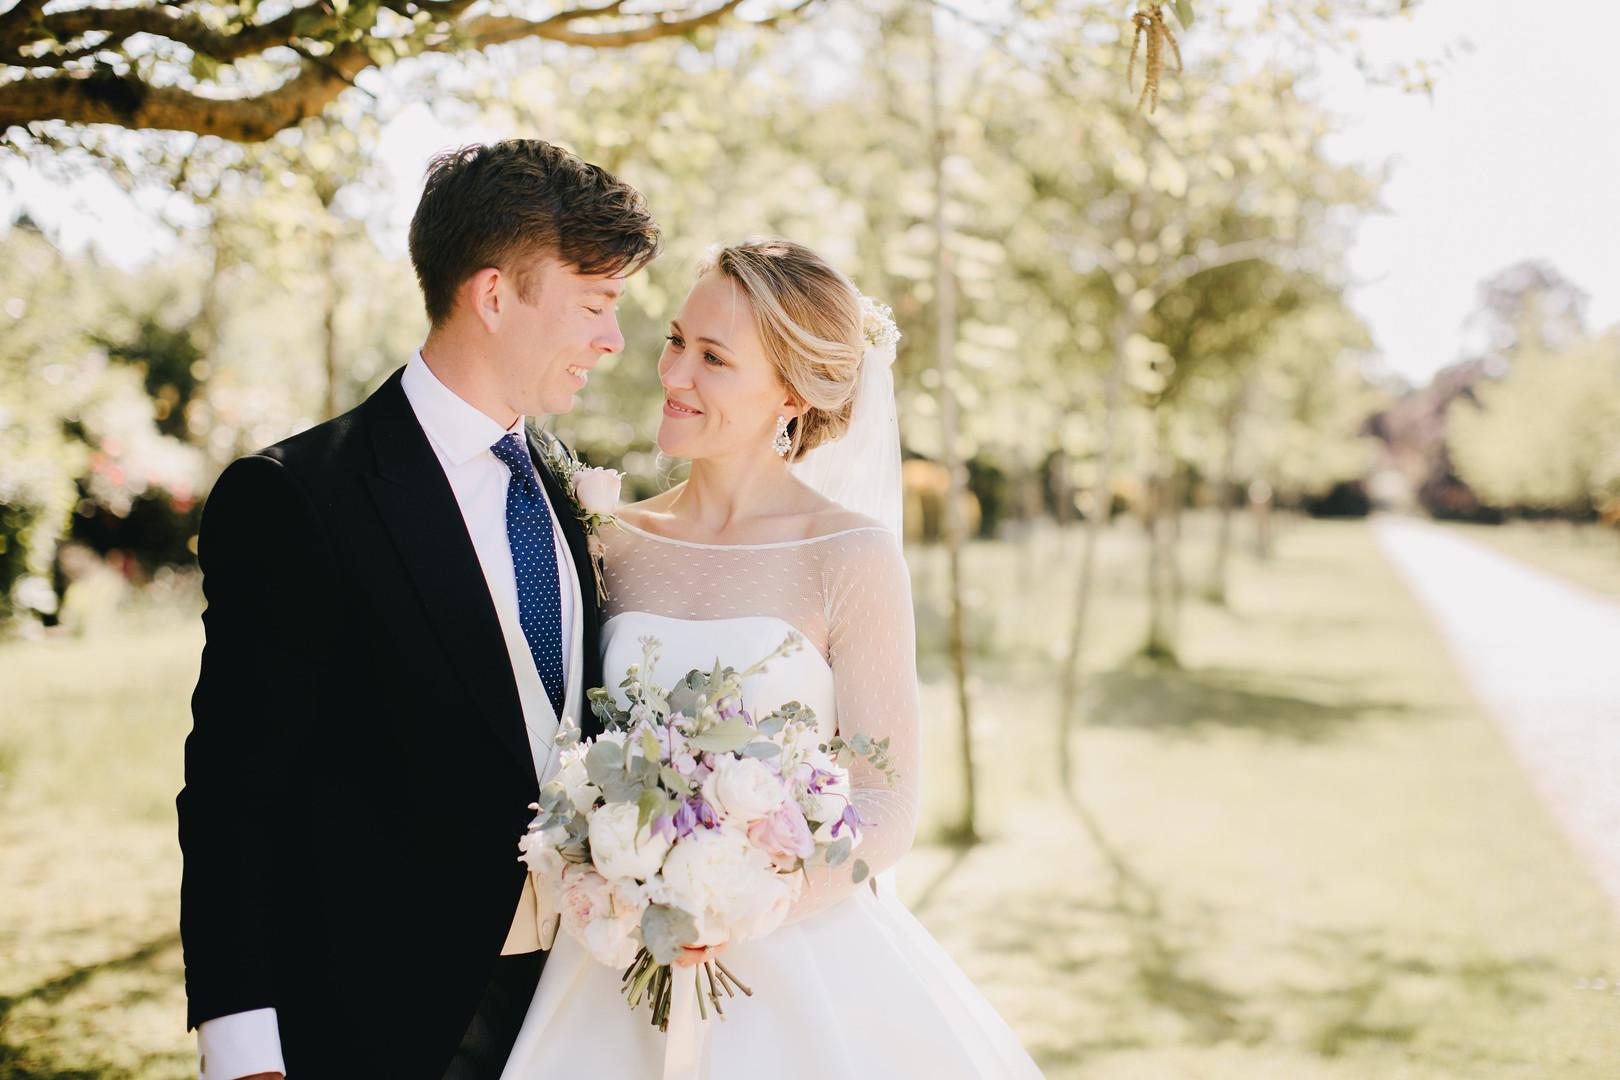 Sarah-and-Ned-Wedding-344.jpg